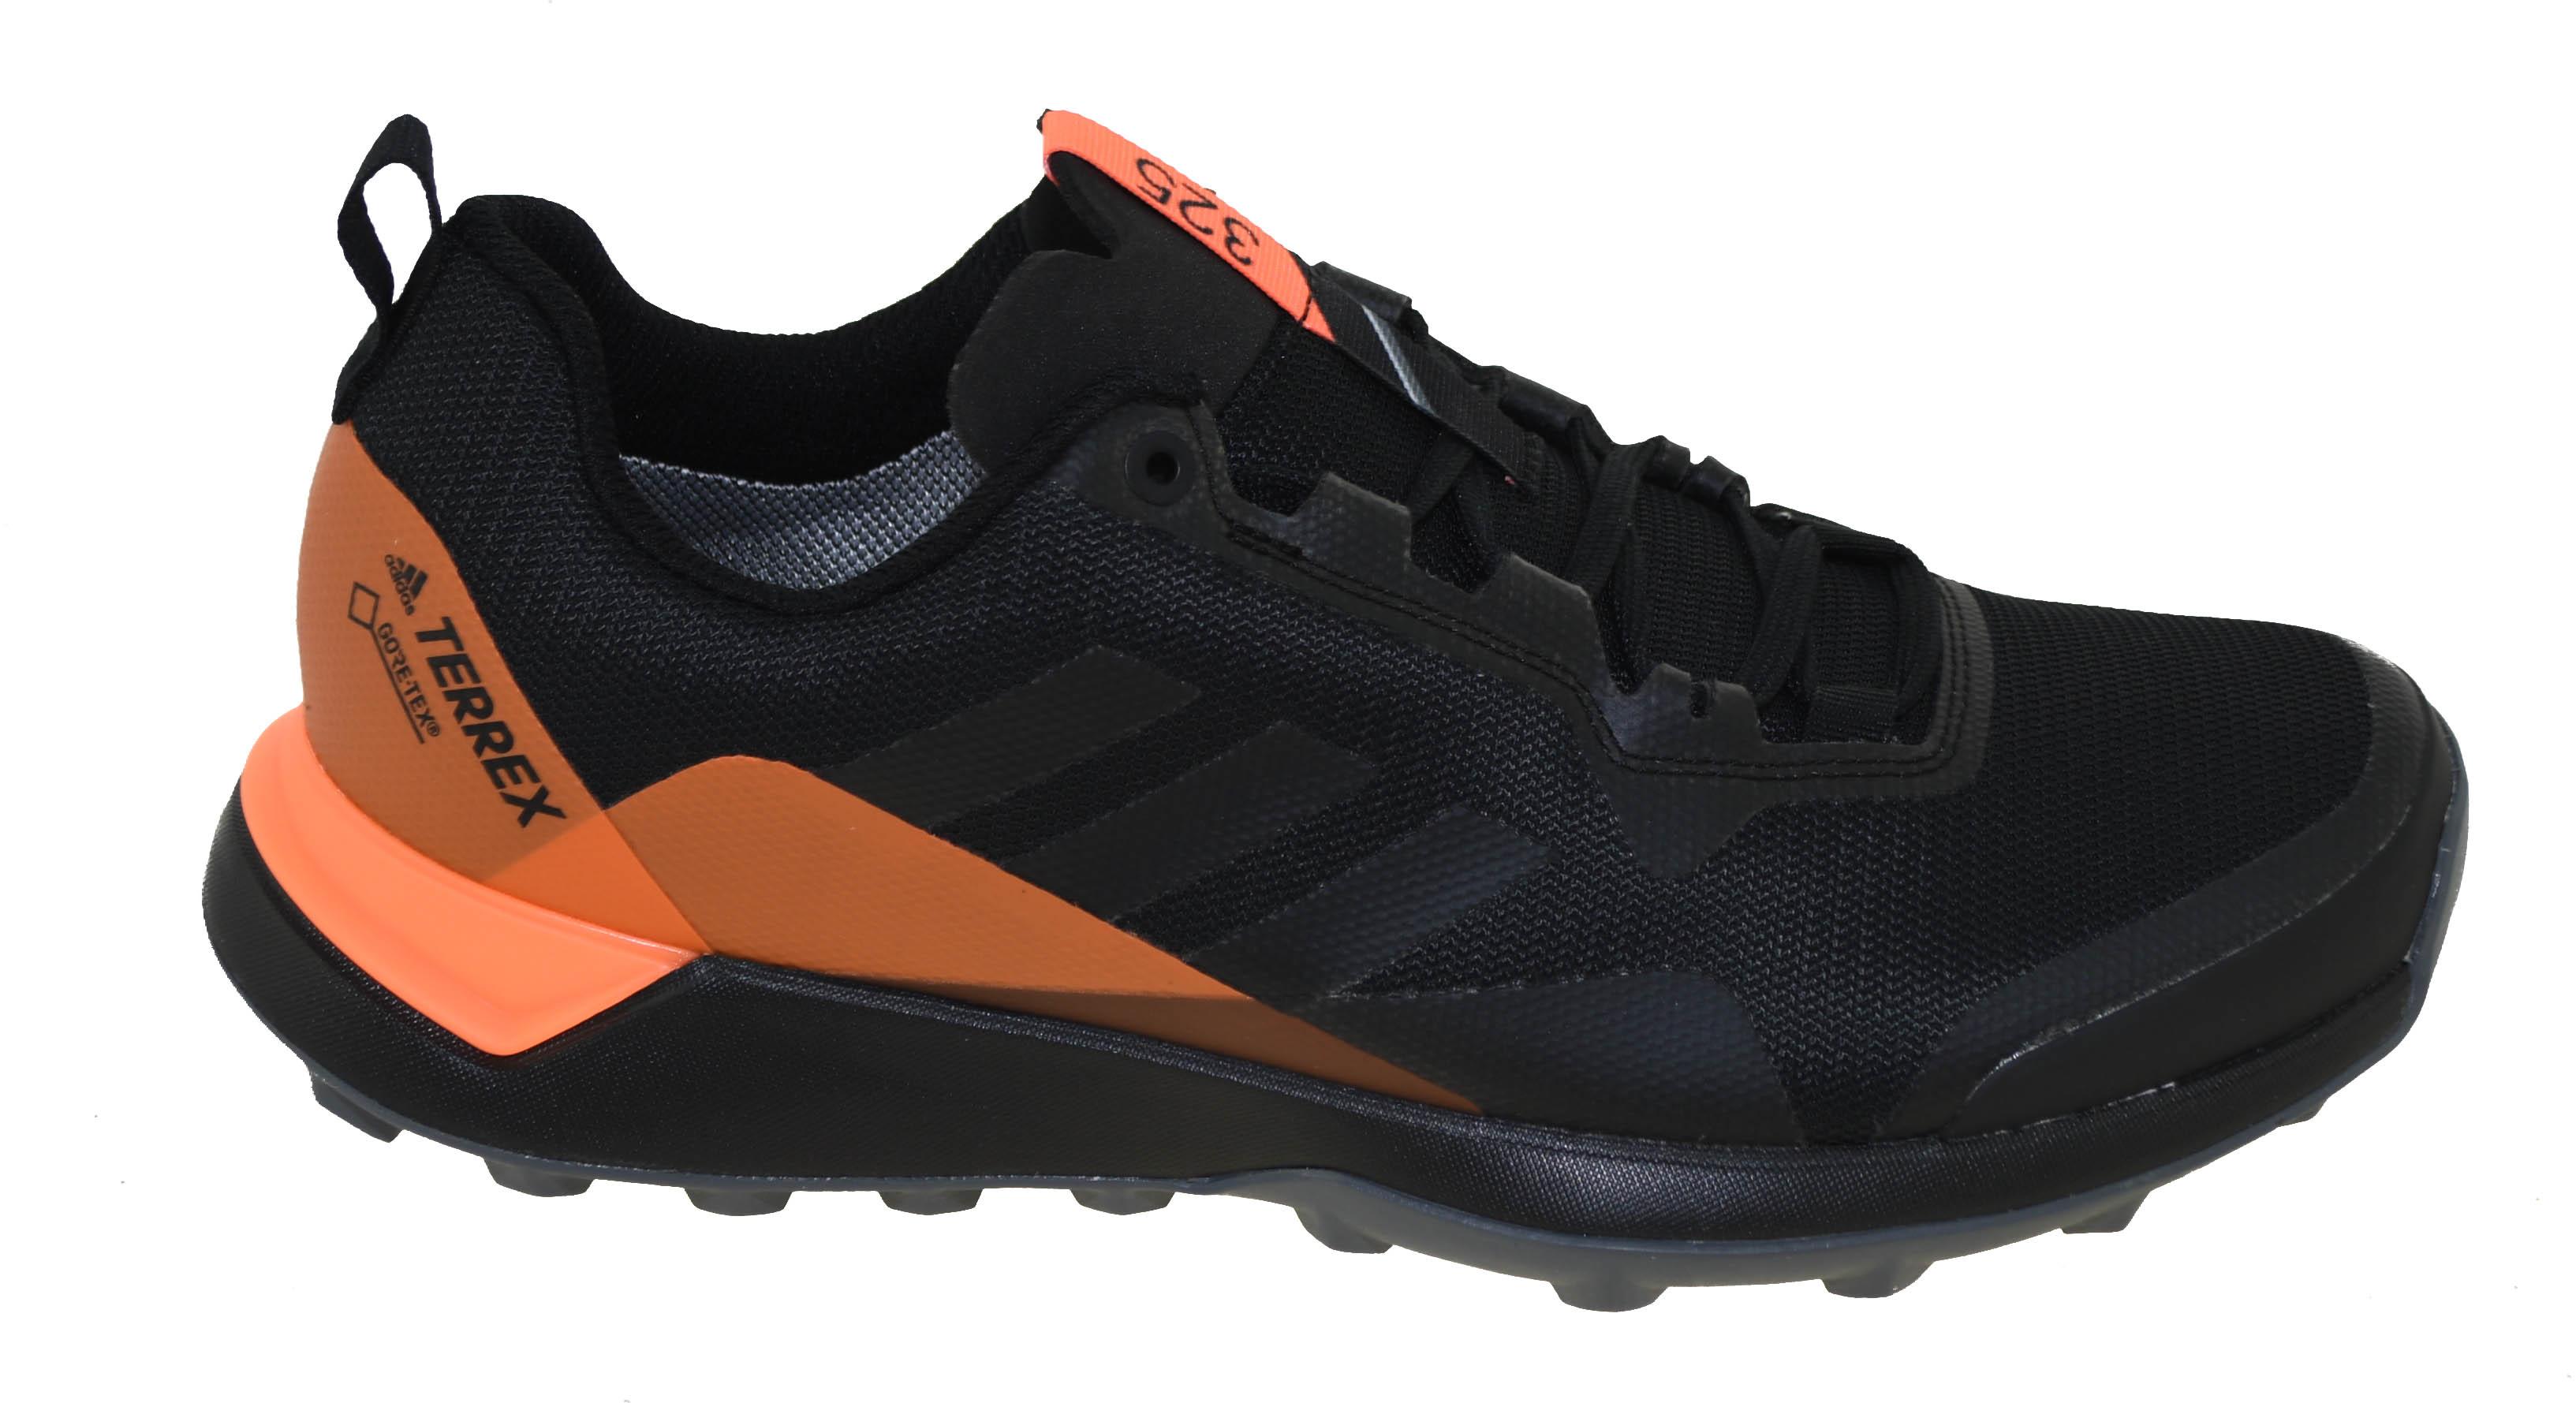 the latest 0ea5d 7cf66 Adidas Men s Terrex CMTK GTX Trail Running Shoe Black Grey Orange Style  AC7922